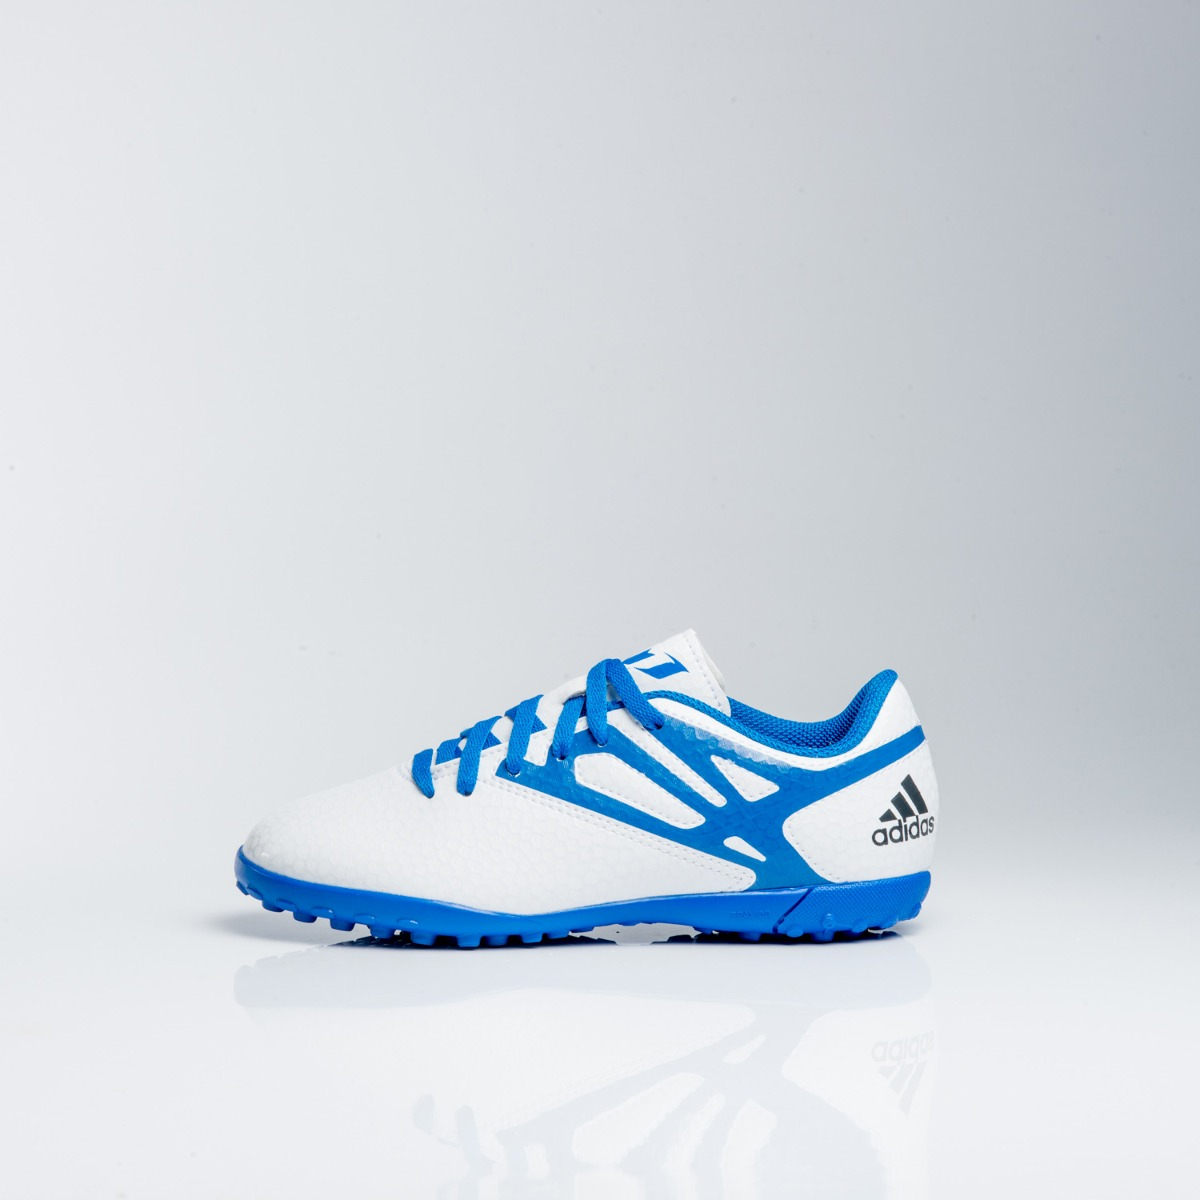 0d21a06ed3eb2 botines adidas messi 15.4 tf j-b25452- open sports. Cargando zoom.